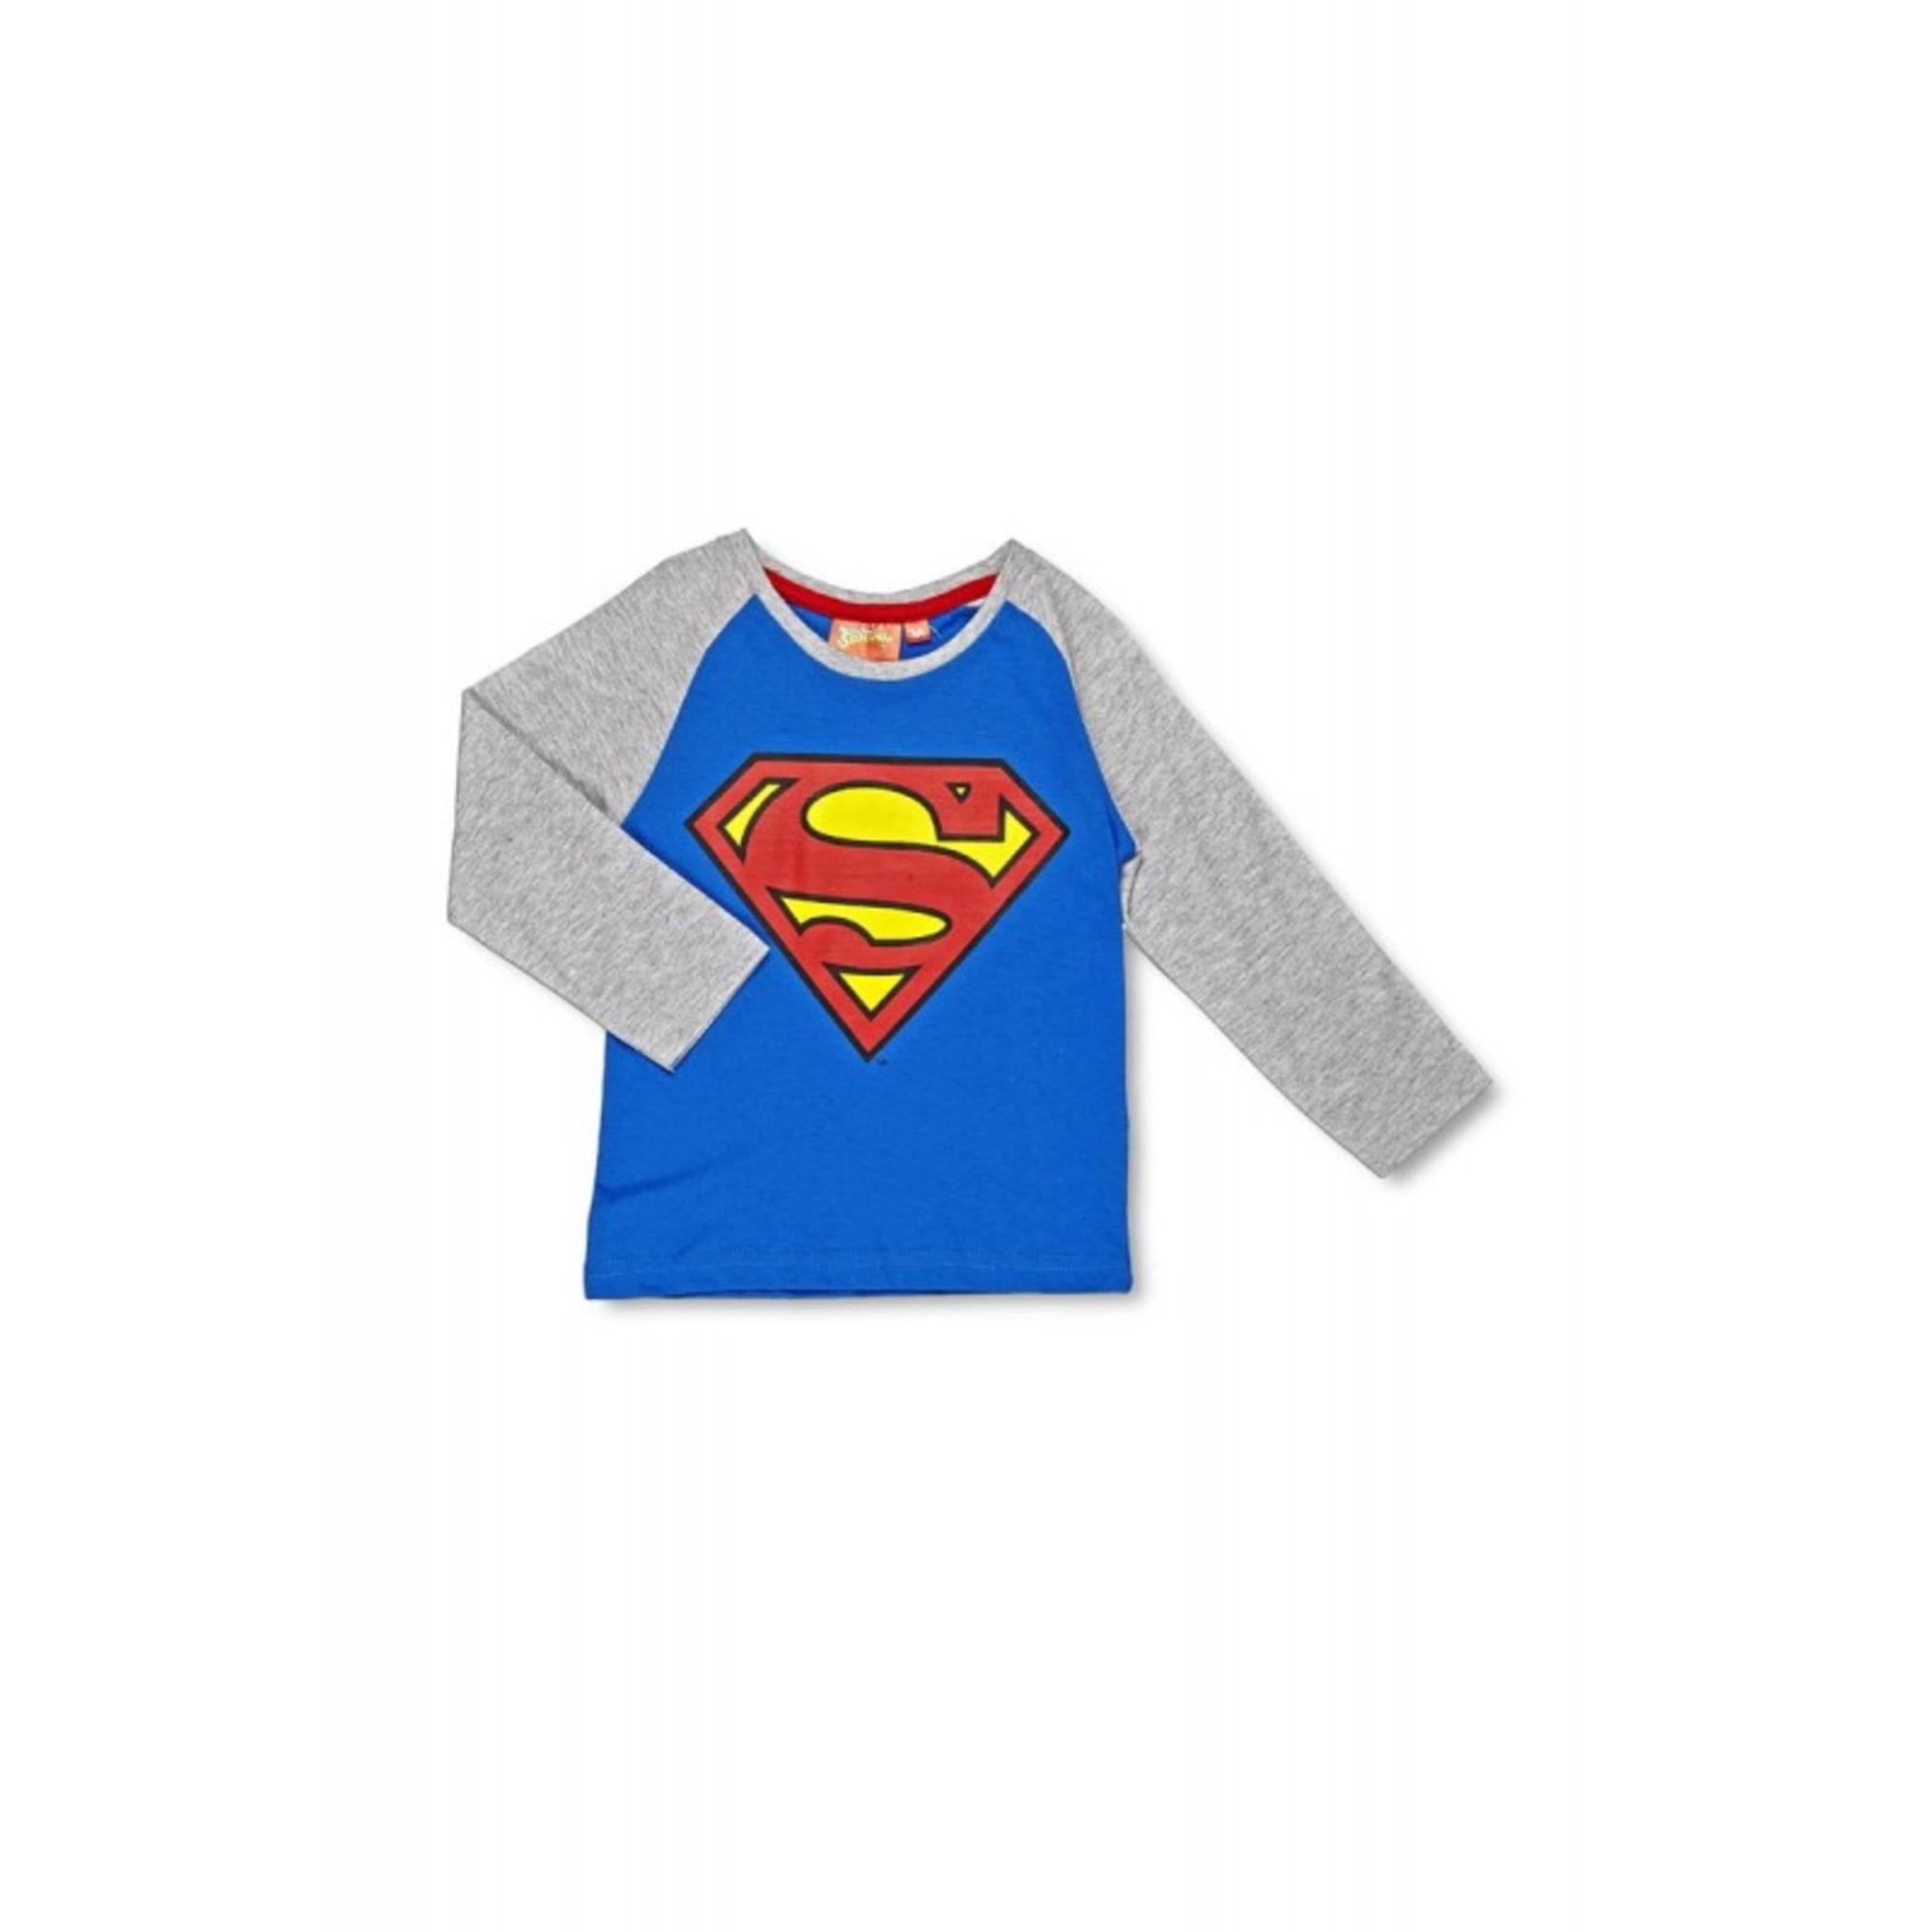 17b1d9f51c65c Sweat SUPERMAN 7-8 ans bleu - 6934697